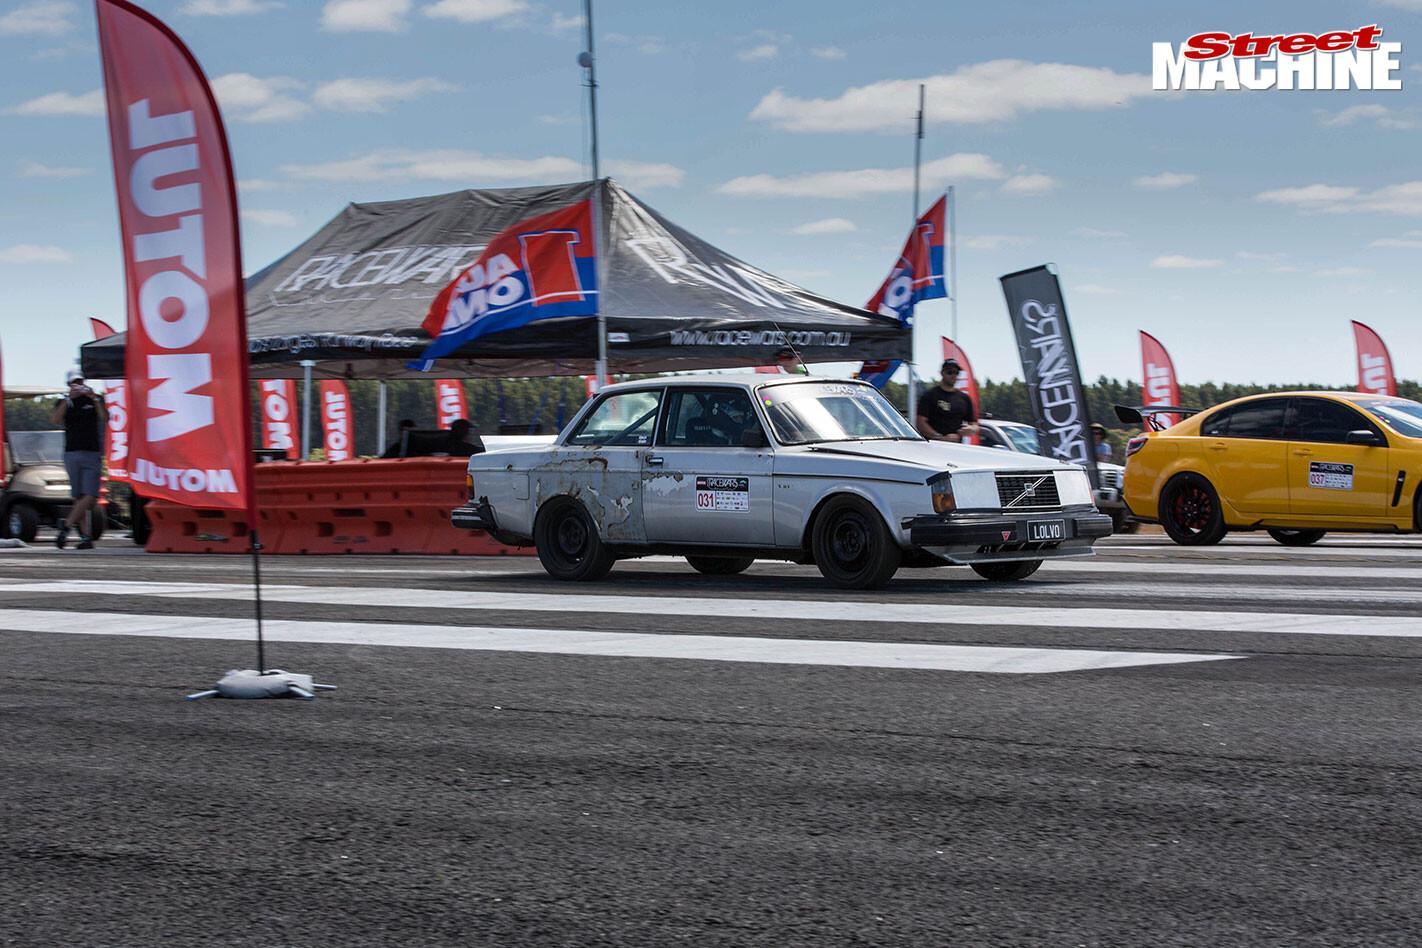 Volvo at racewars